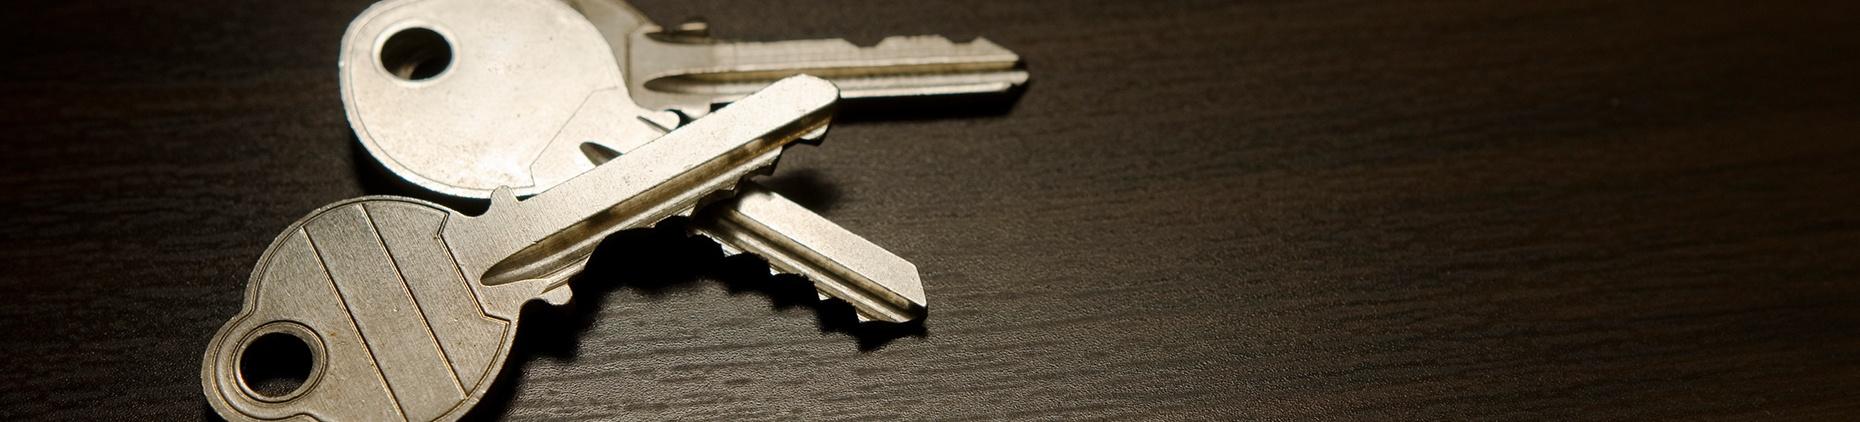 Free Webinar: 4 Essential Keys for Sales Negotiation Success